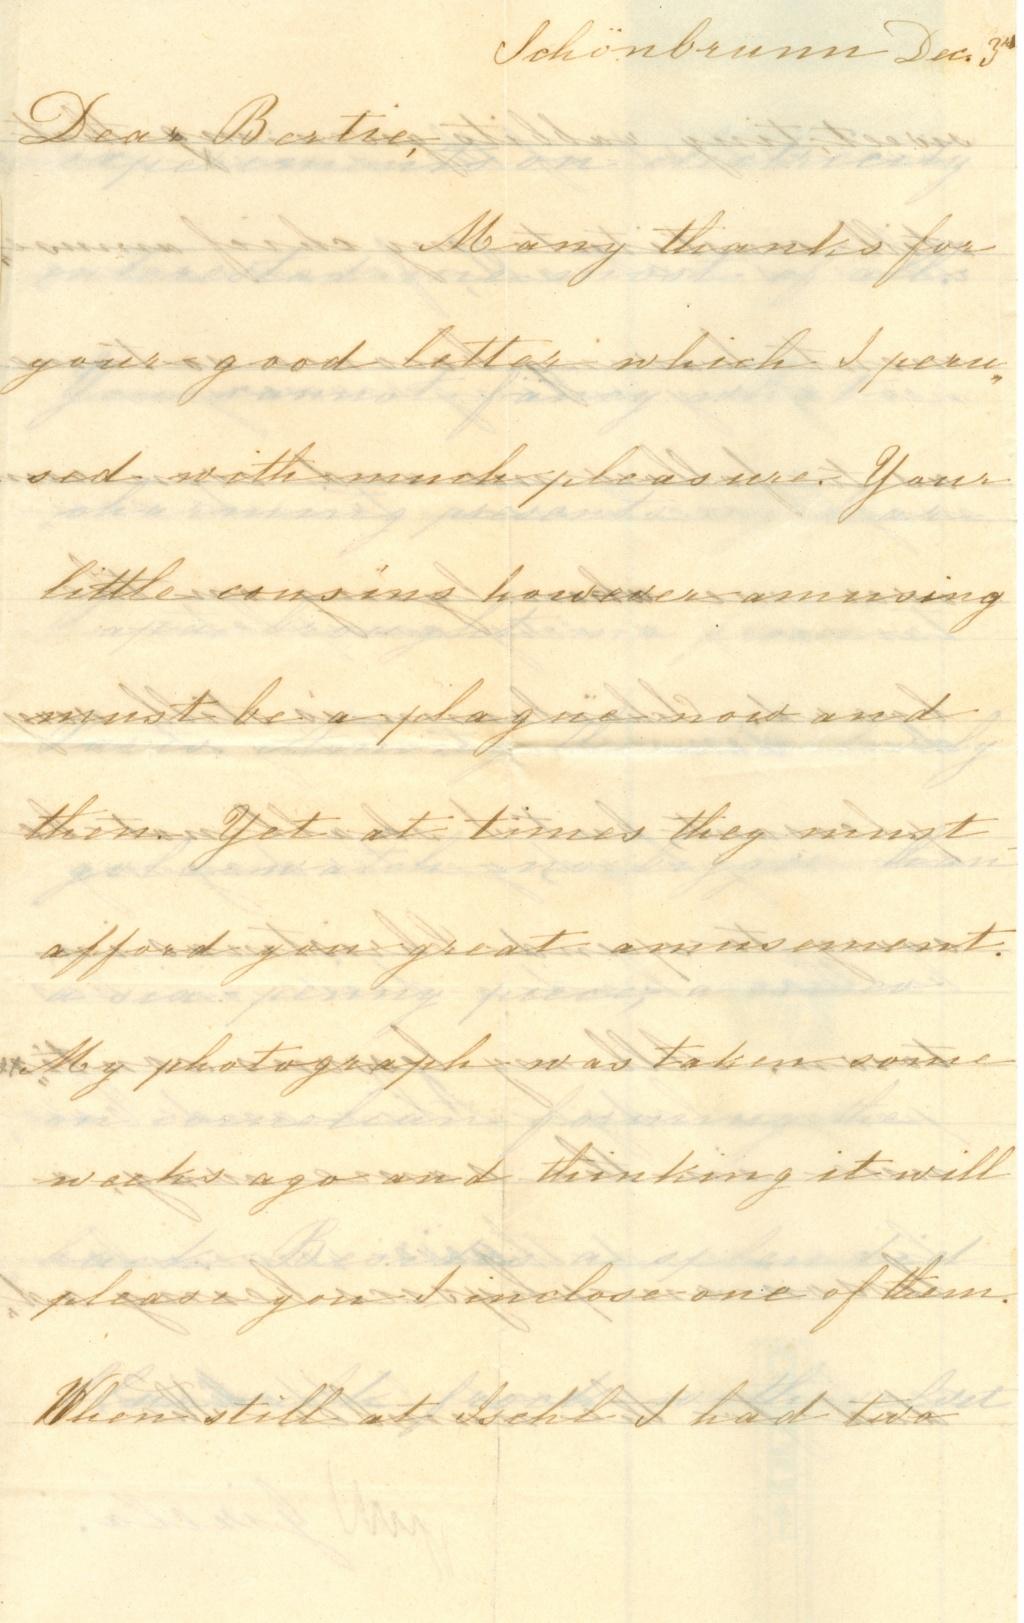 Nachtrag - Freimarken-Ausgabe 1867 : Kopfbildnis Kaiser Franz Joseph I - Seite 23 Gisela10